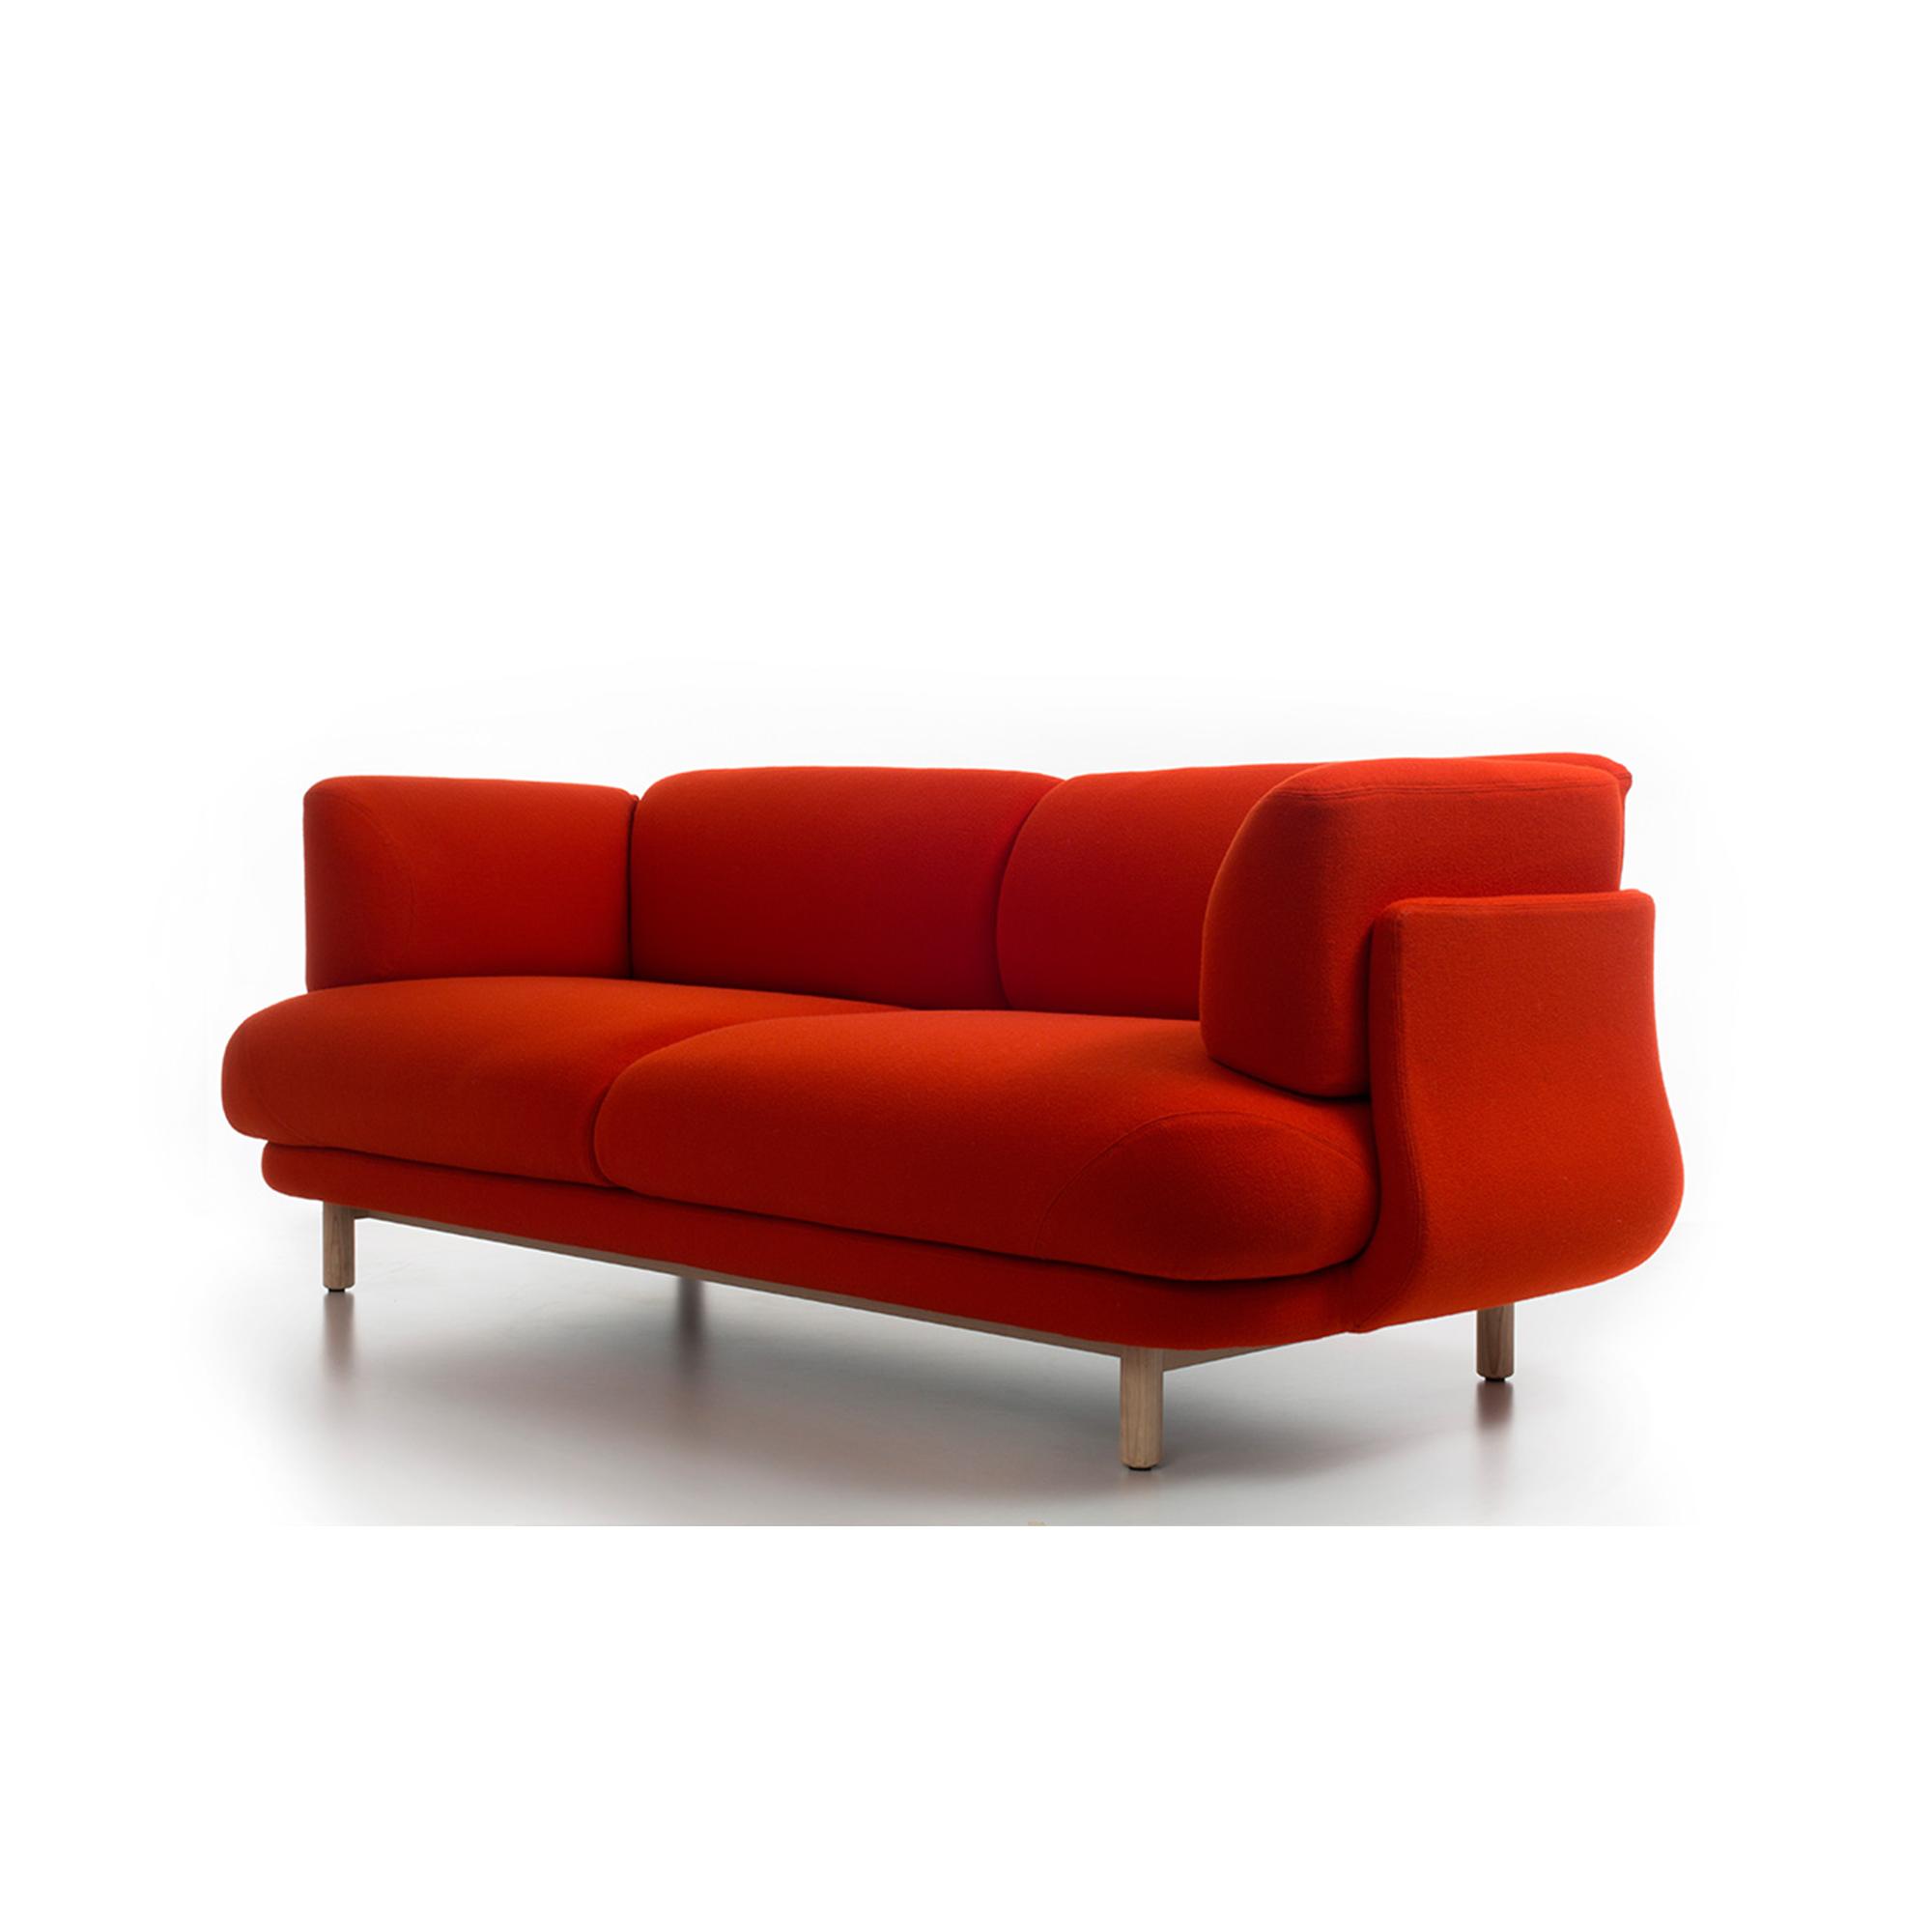 Designapplause Peg Sofa Nendo